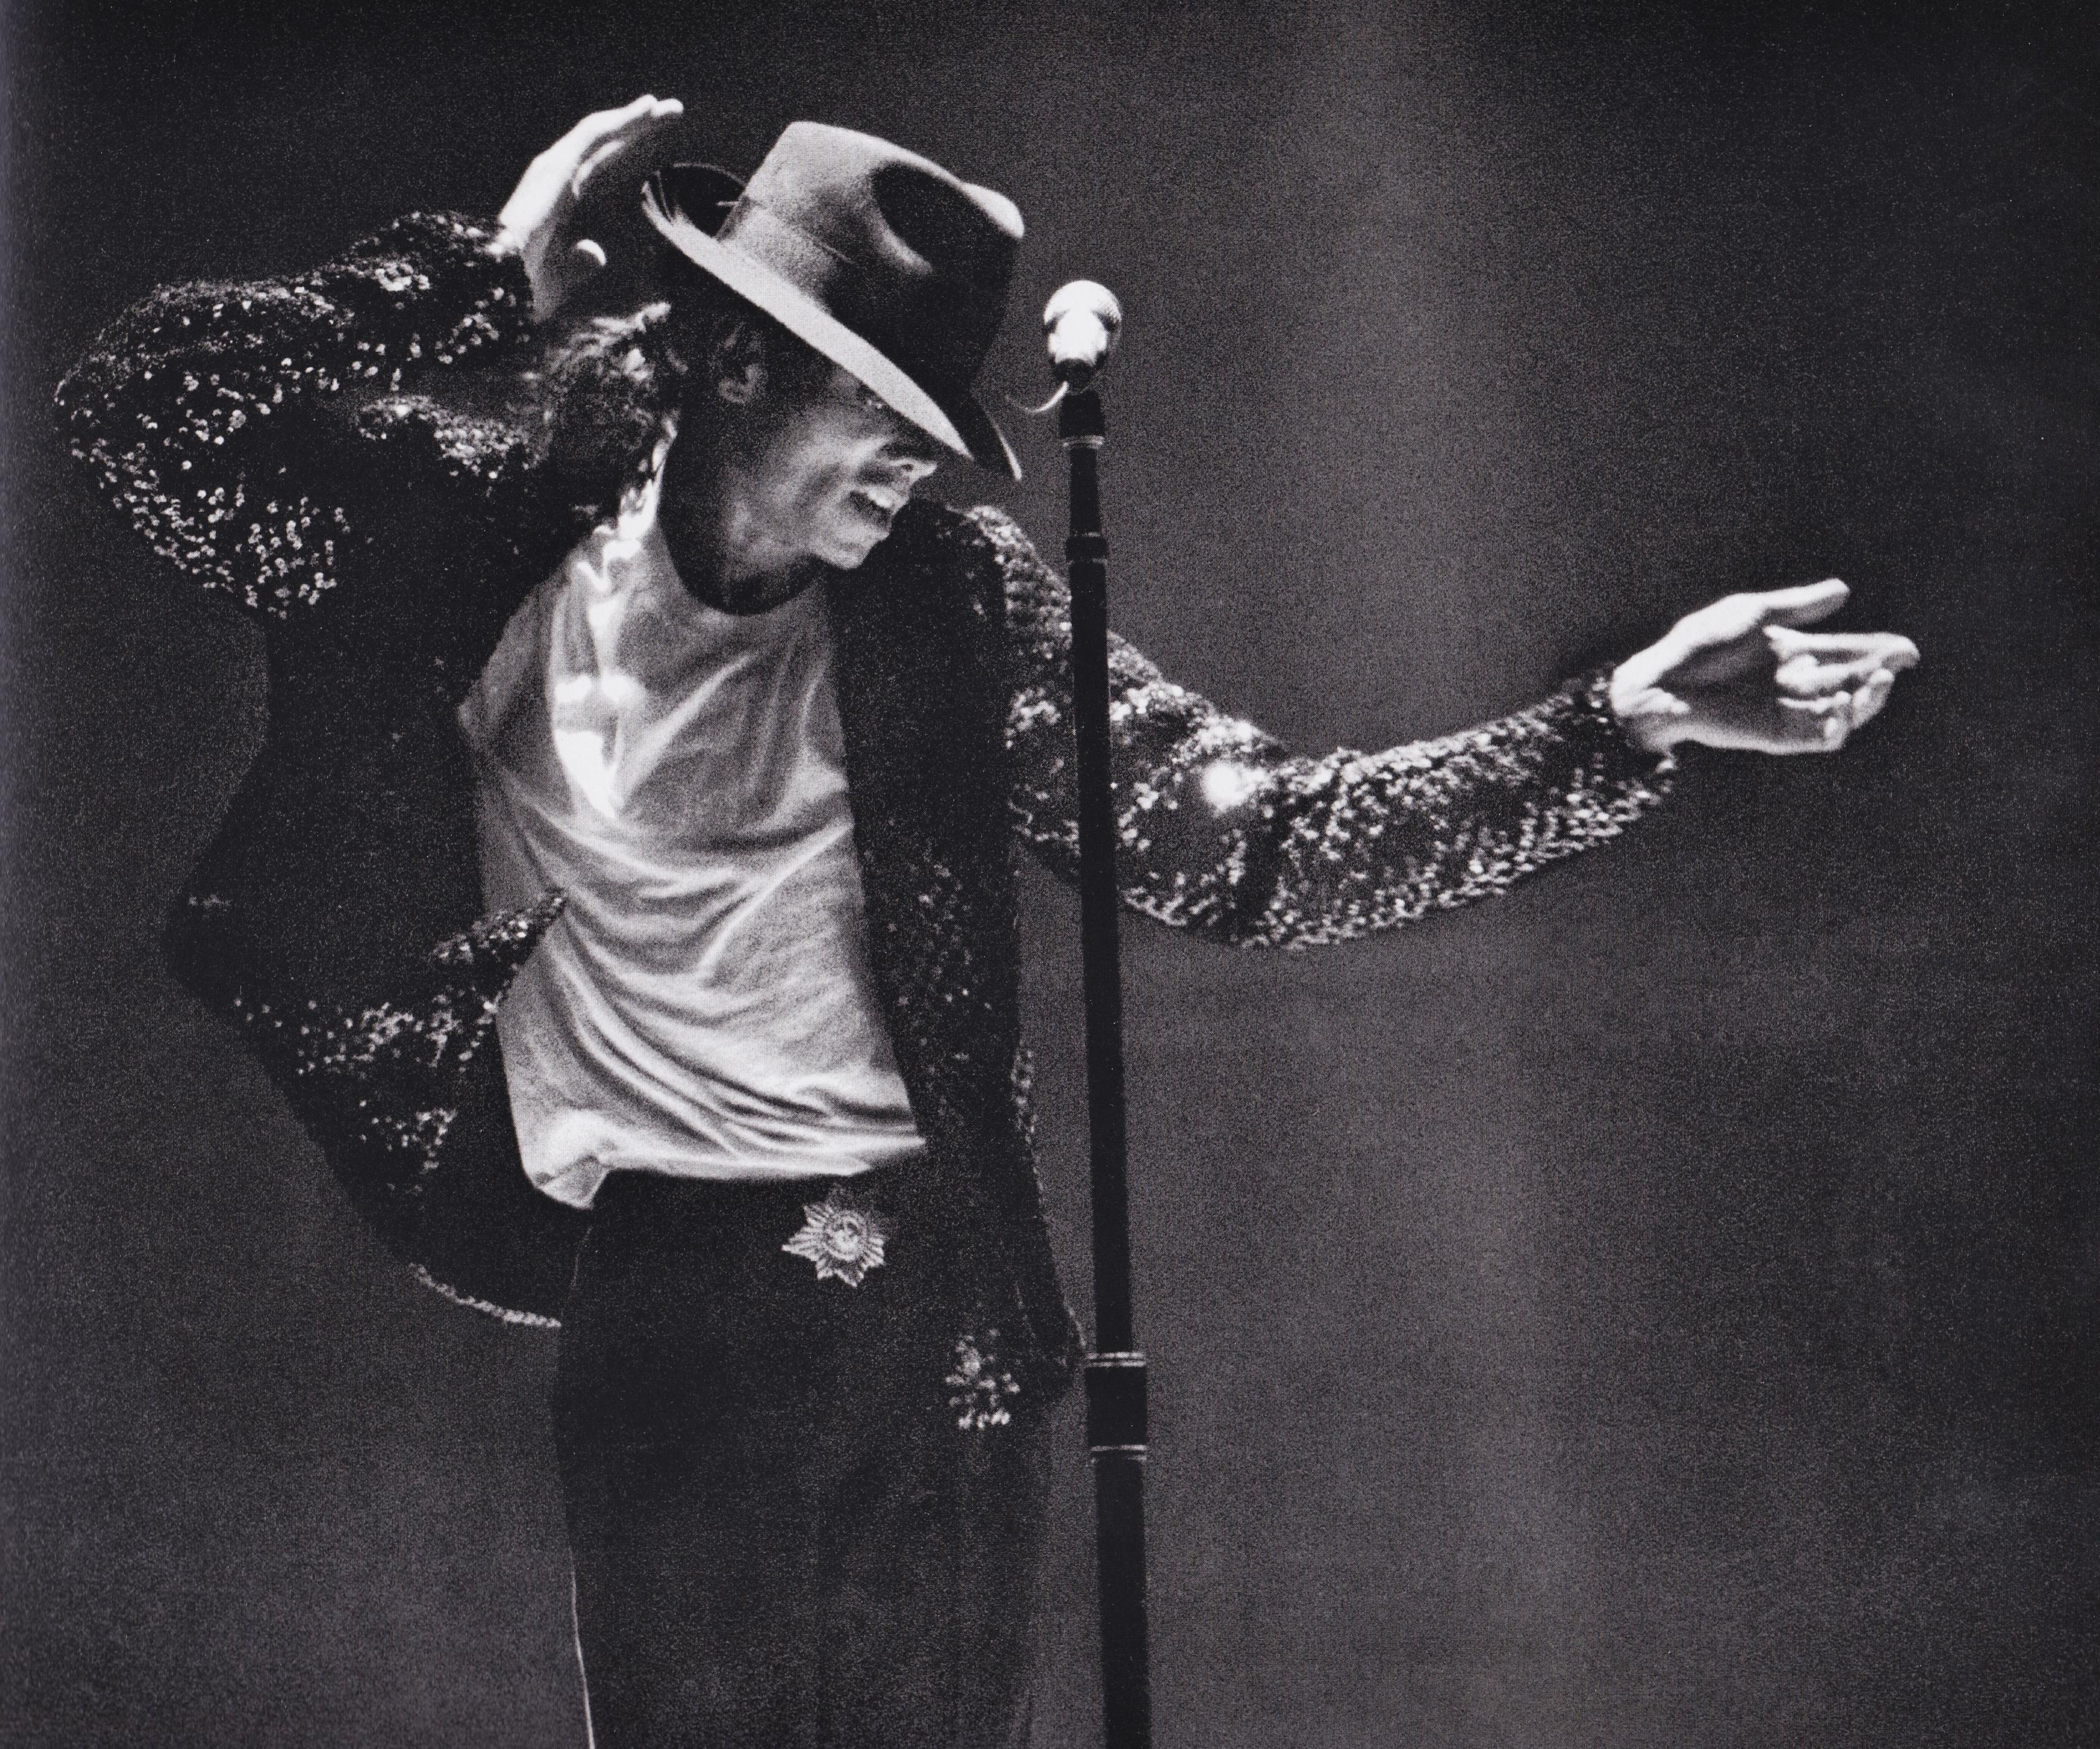 Michael Jackson - HQ Scan - Bad Tour